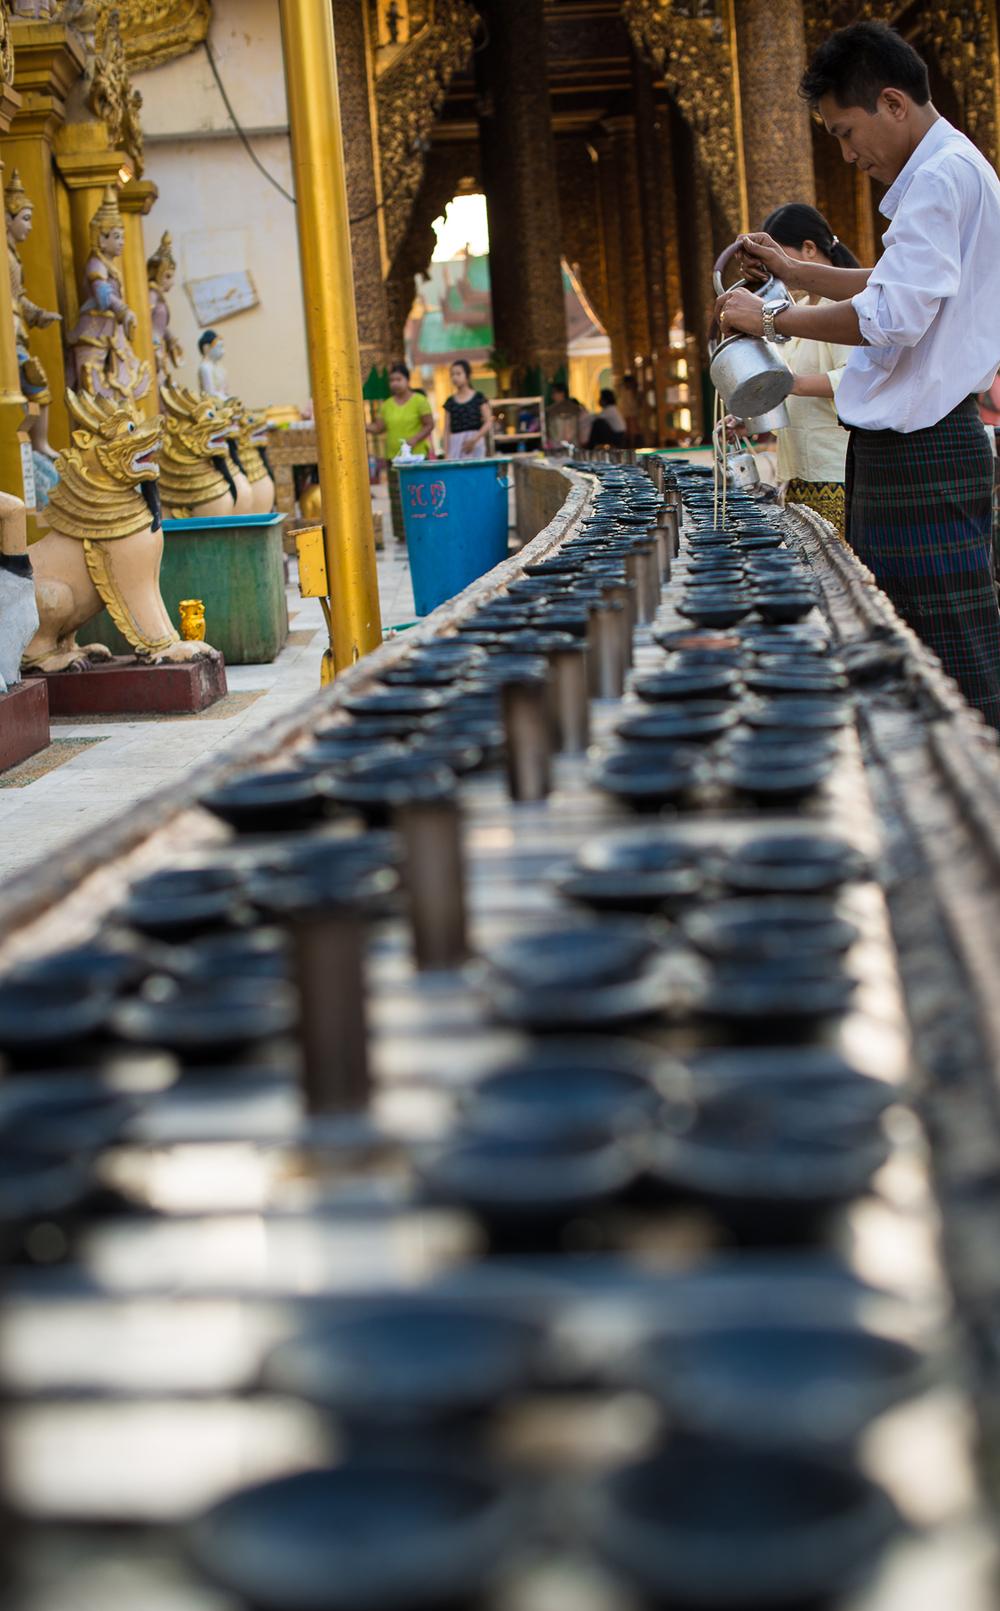 Oil lamps being filled at Shwedagon Pagoda. Yangon, Myanmar